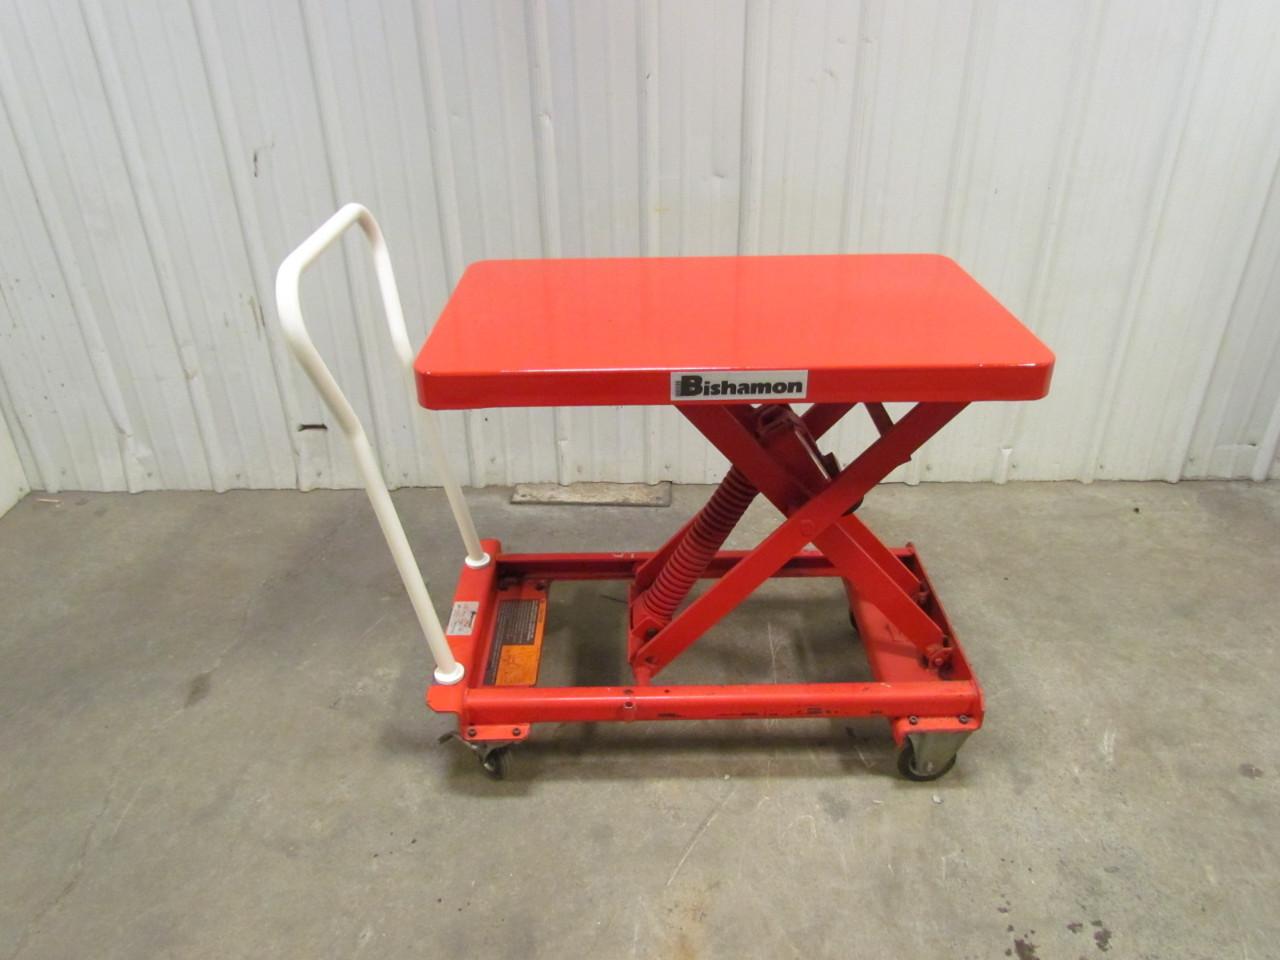 Self Leveling Tables : Bishamon esx self leveling spring scissor lift cart